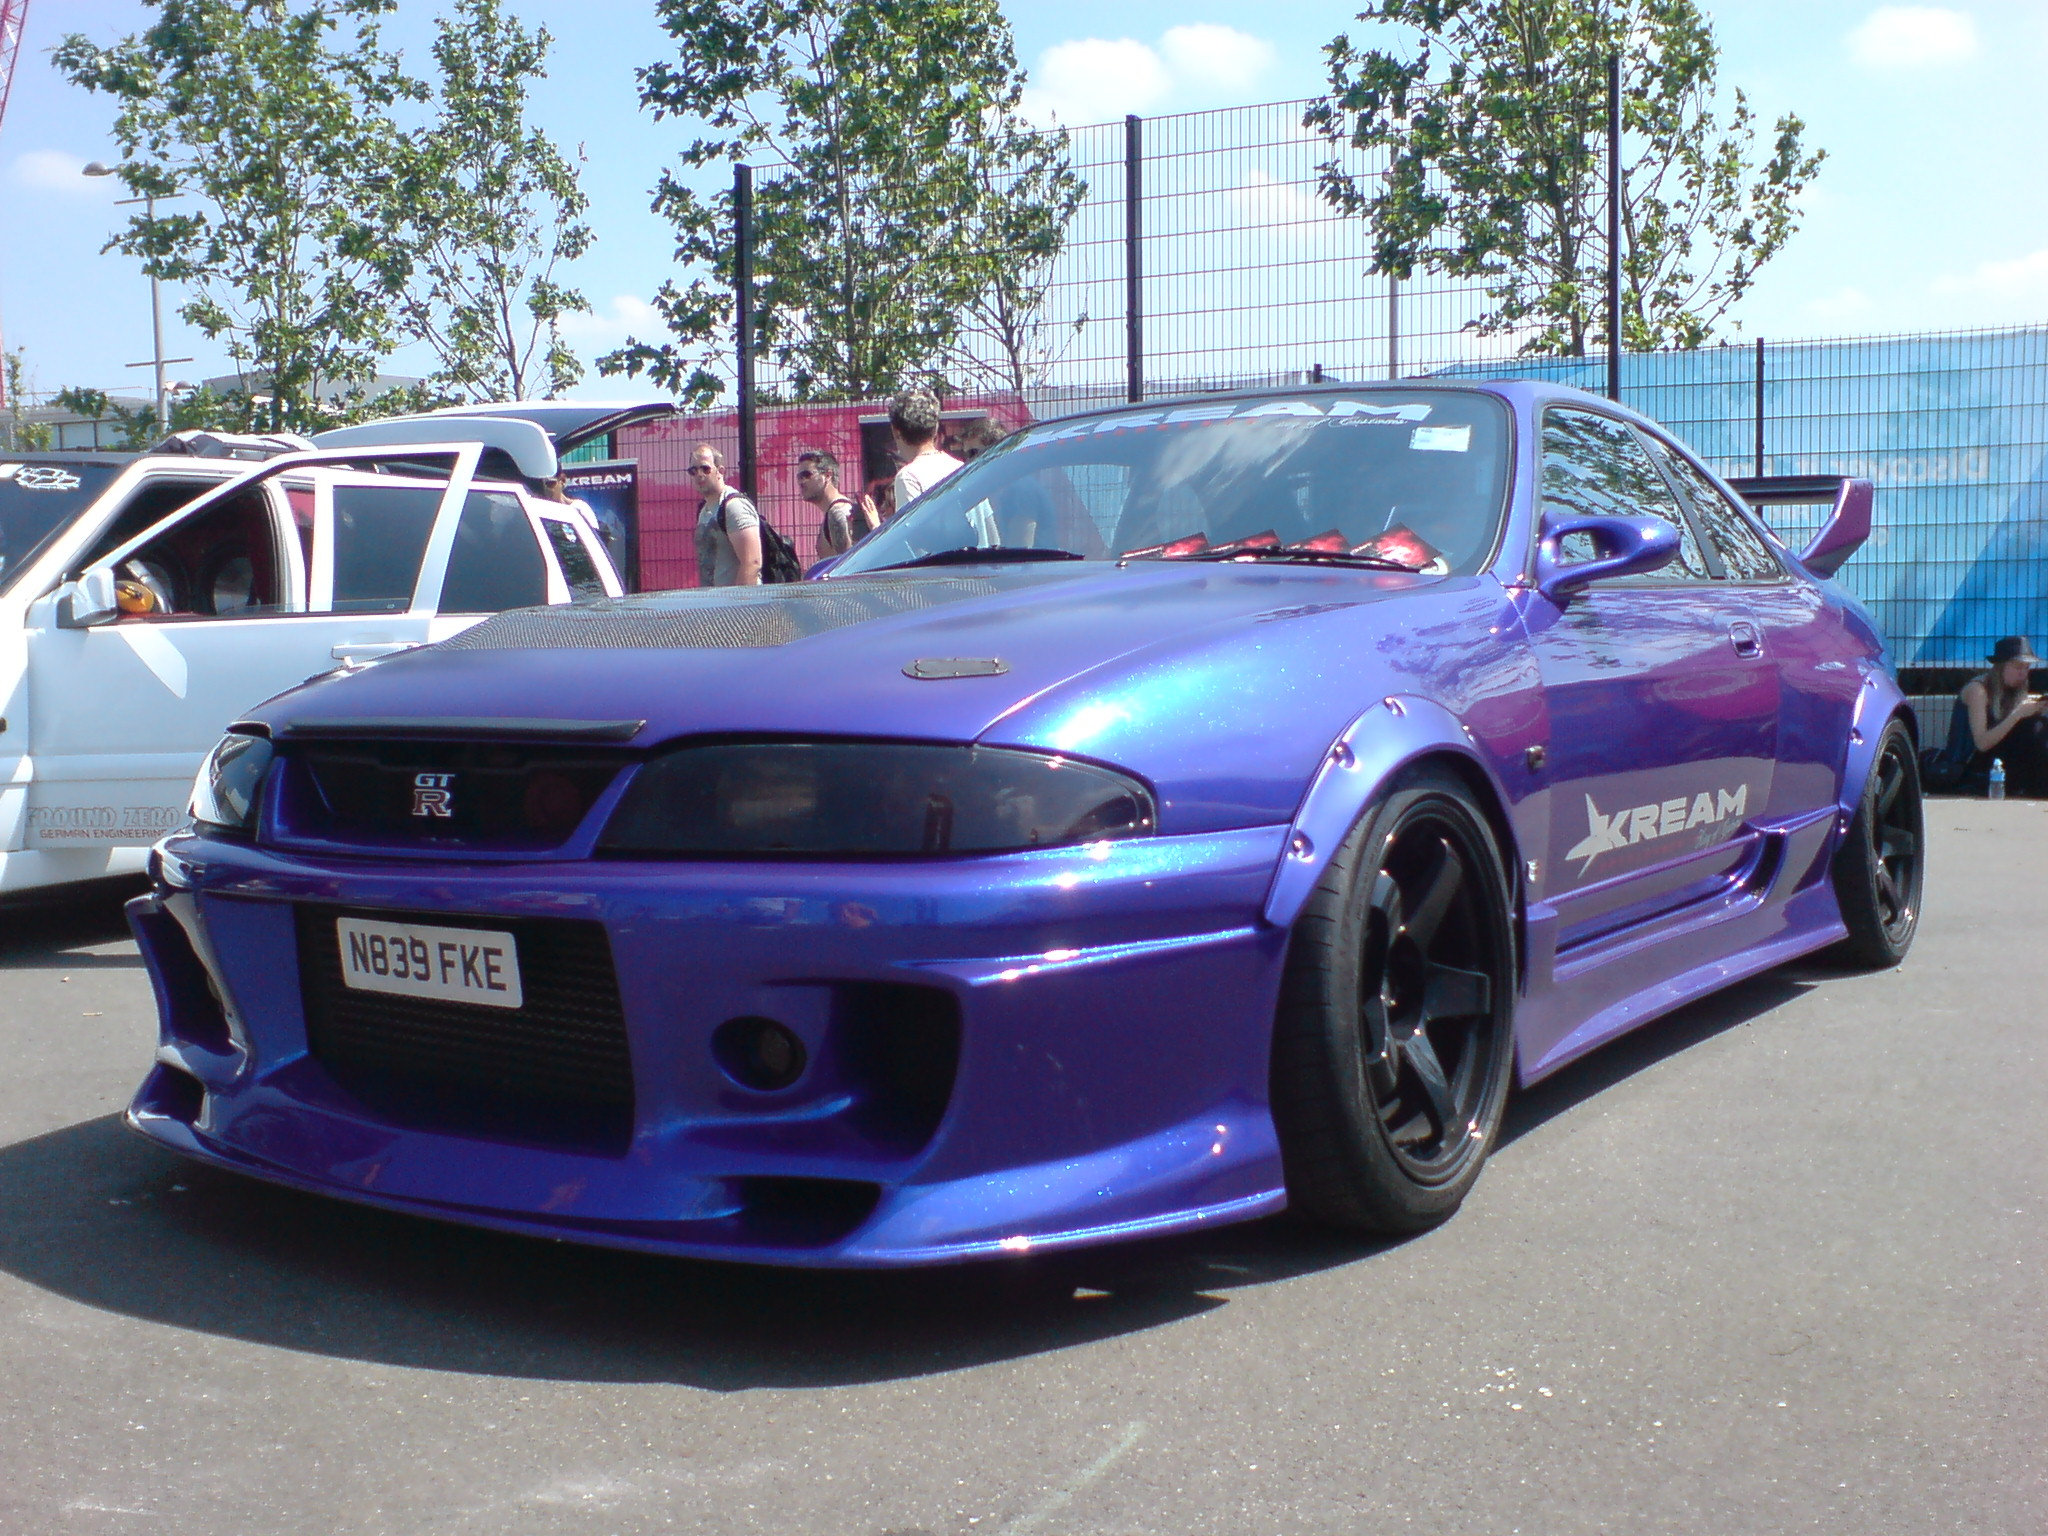 Drift Racing cars drive sideways